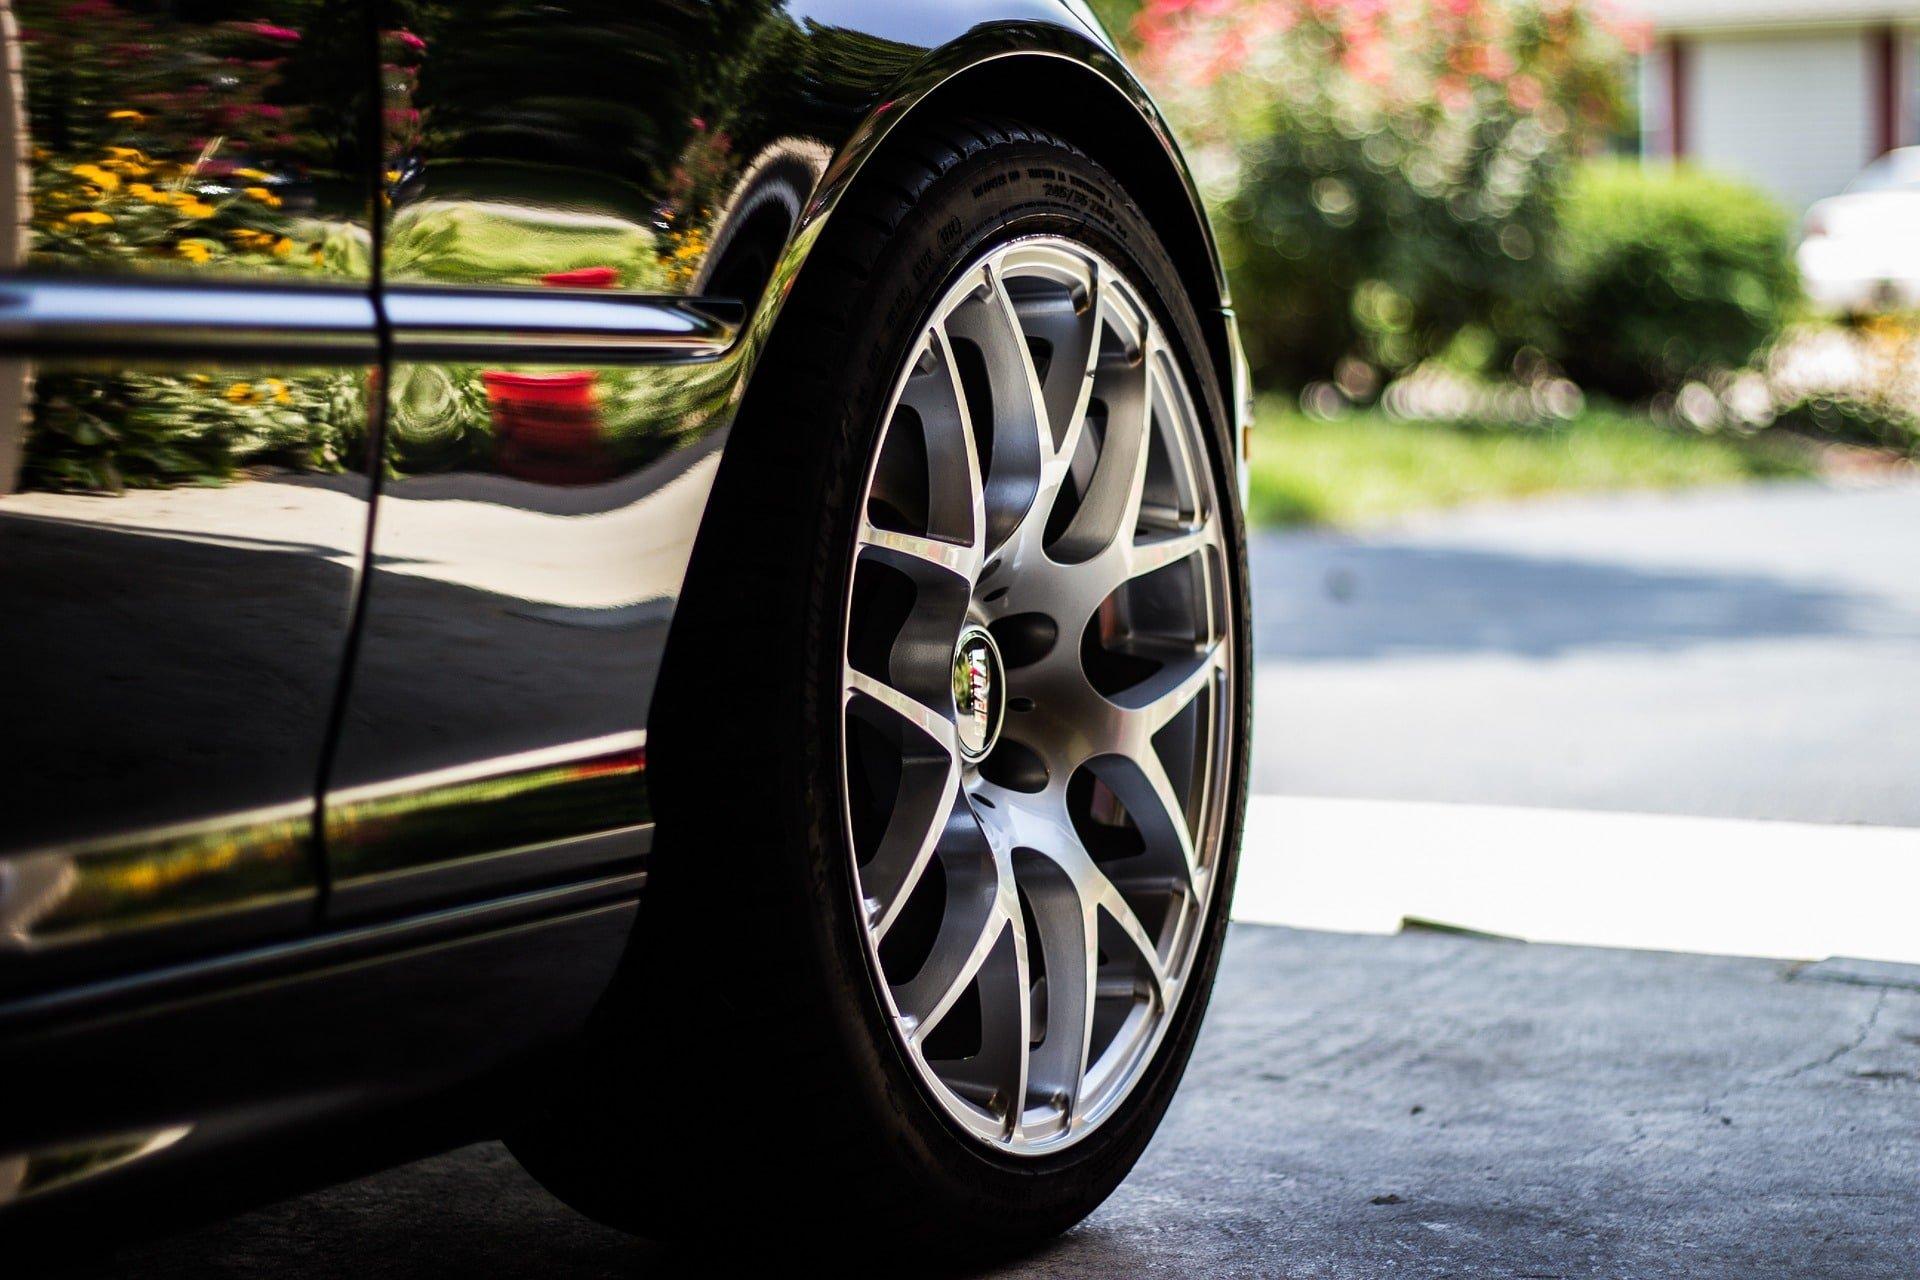 Closeup of a tire on a sleek, shiny car